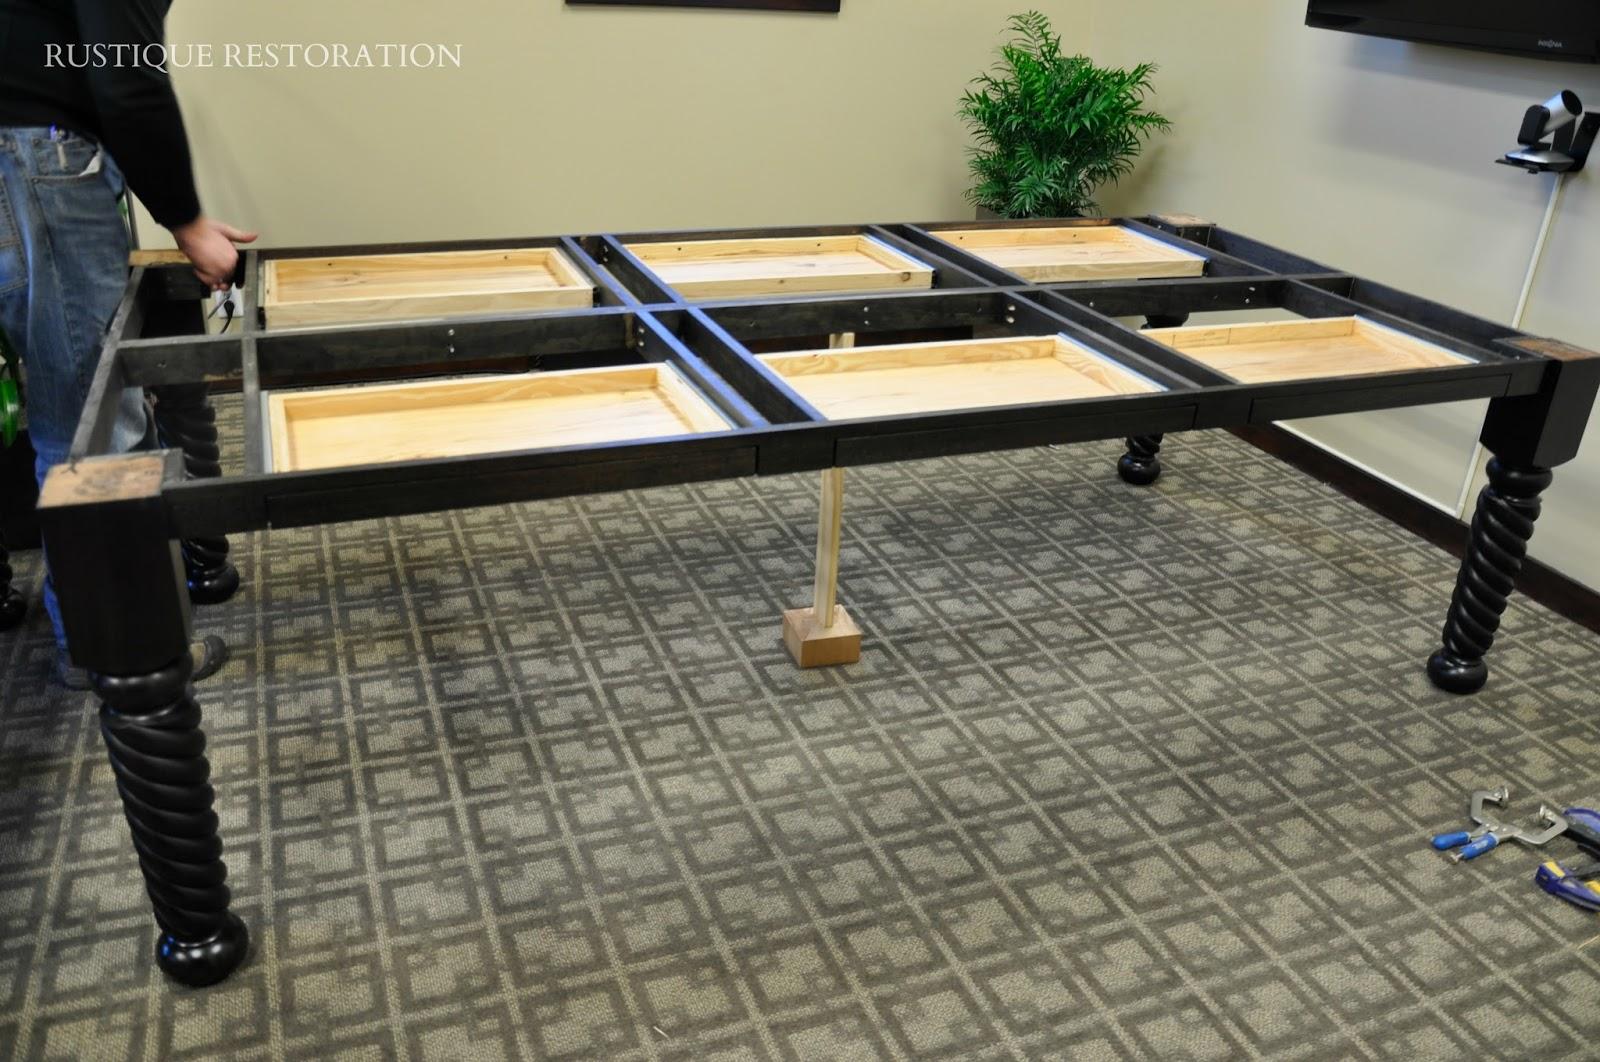 Rustique Restoration - Build a conference table